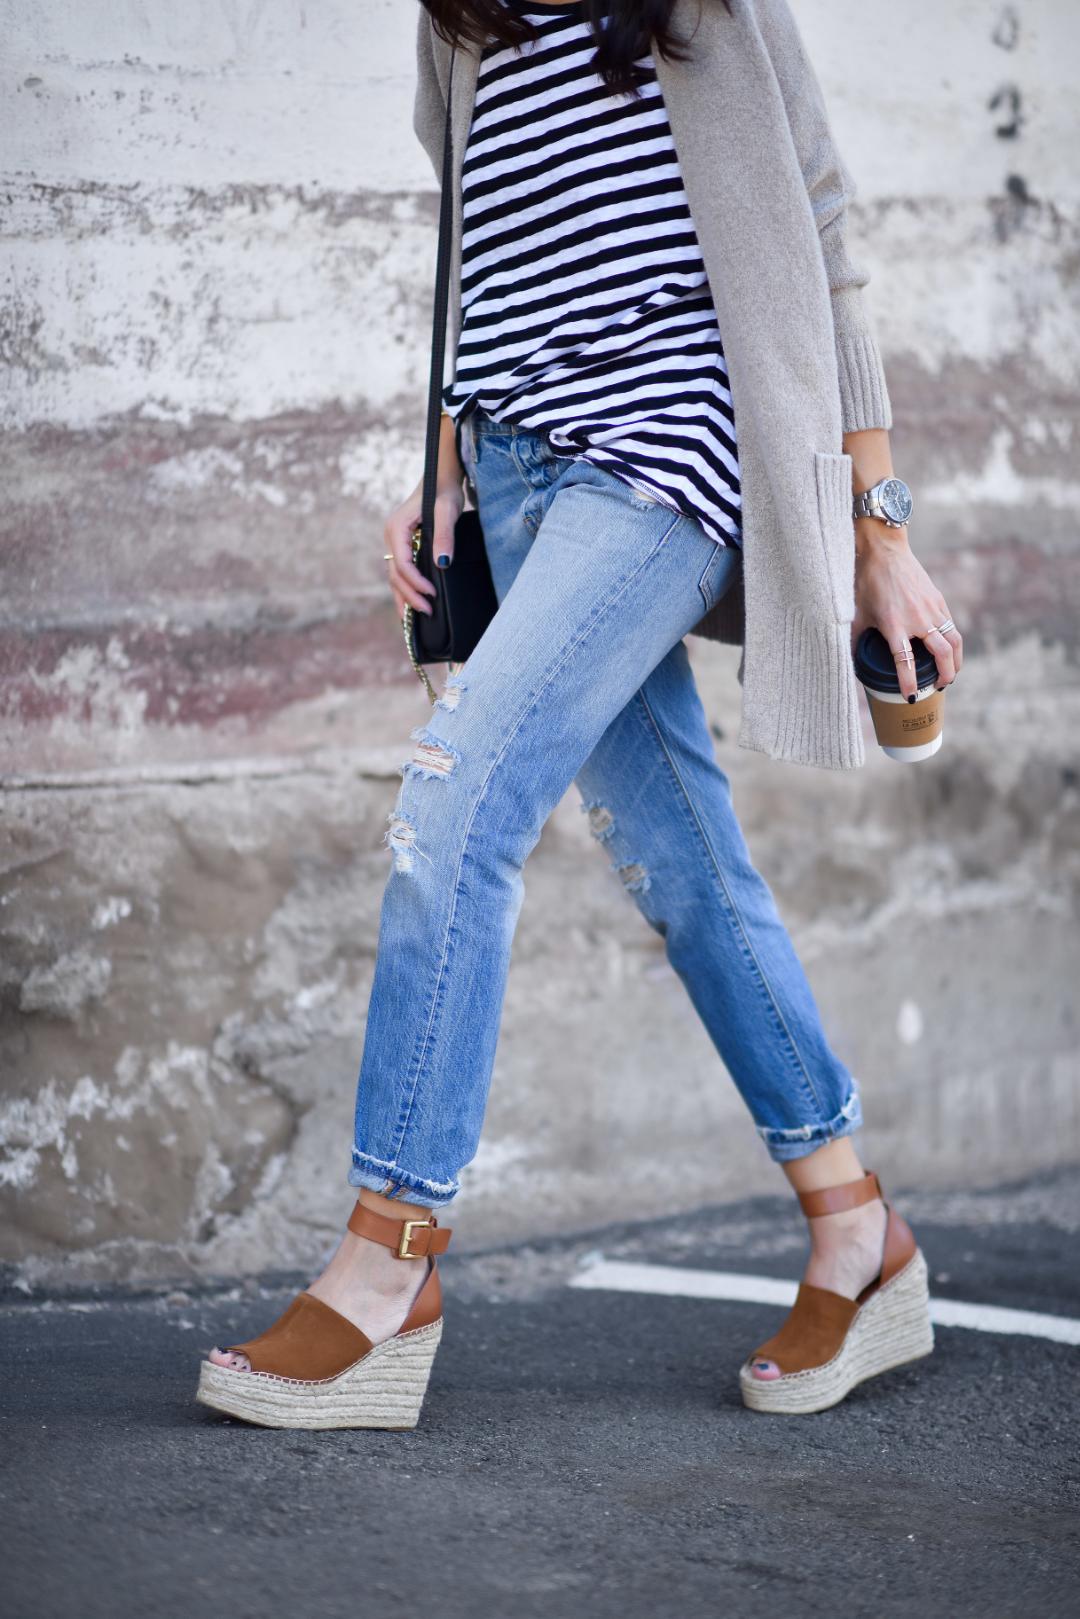 Zara_ElizabethandJames_CurrentElliot_FashionBlogger_LucysWhims_Levis_Chloe_Faye_MarcFisher.com